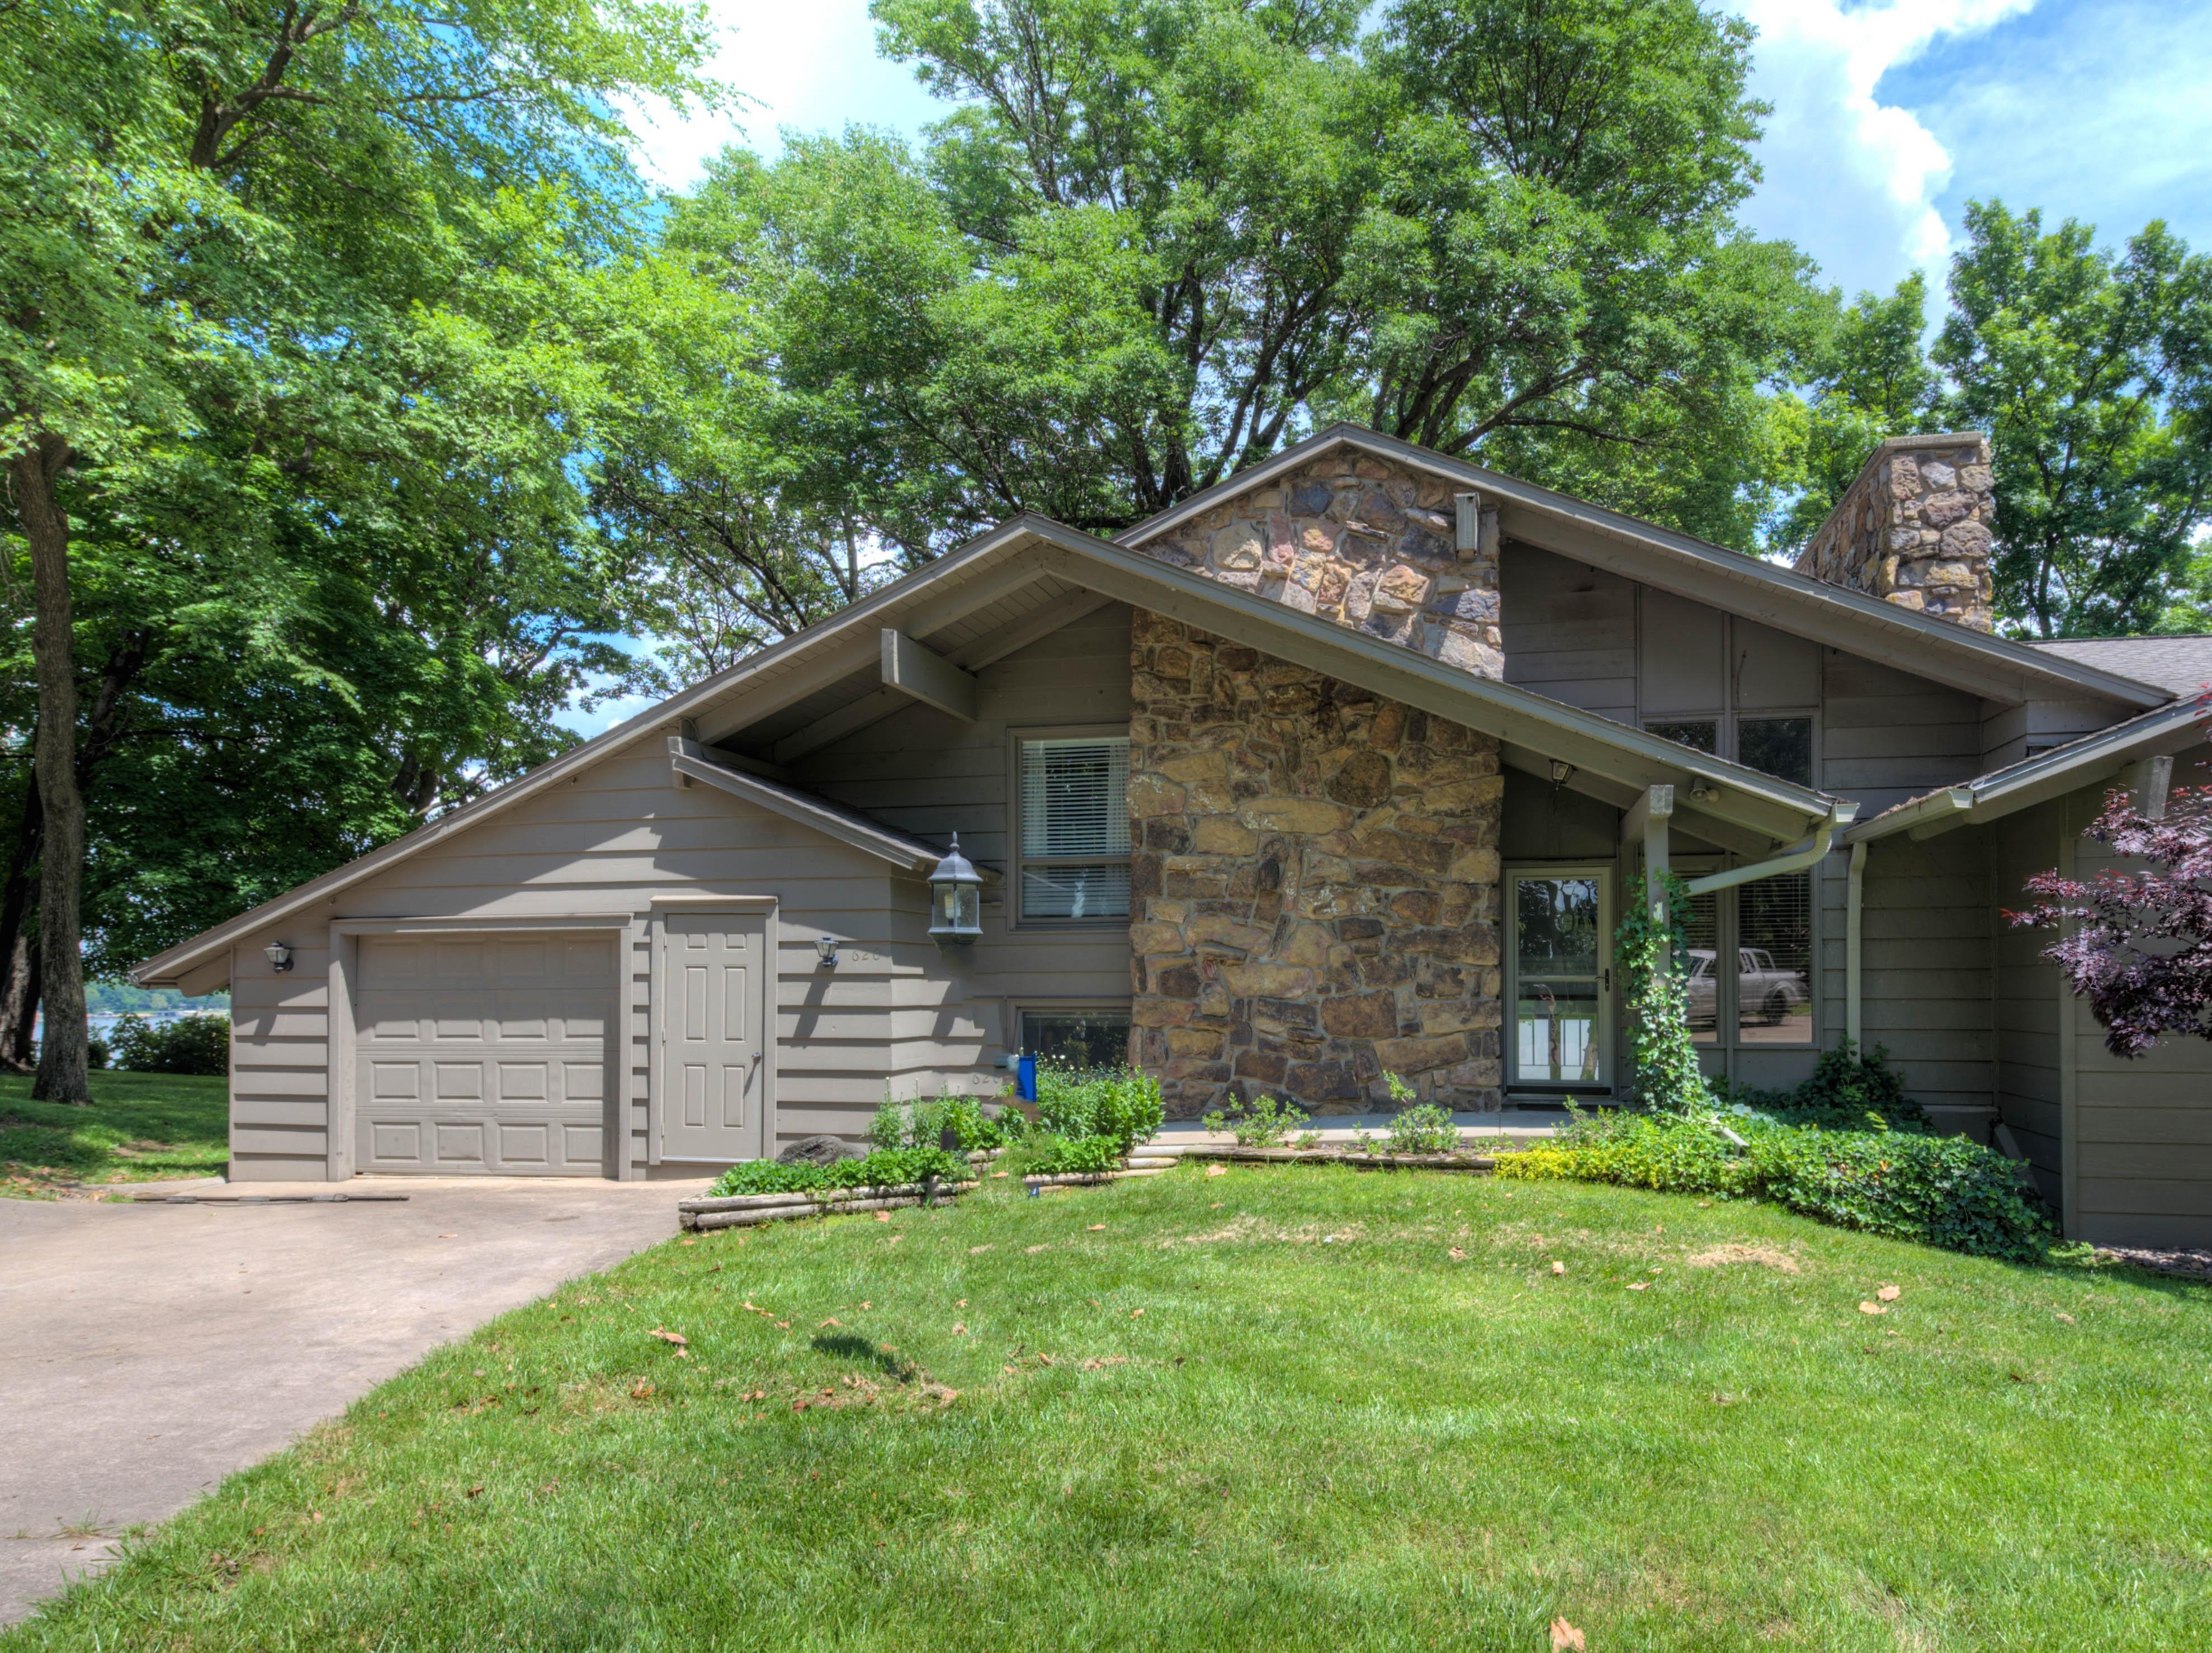 57450 E Hwy 125 #620 Property Photo 1